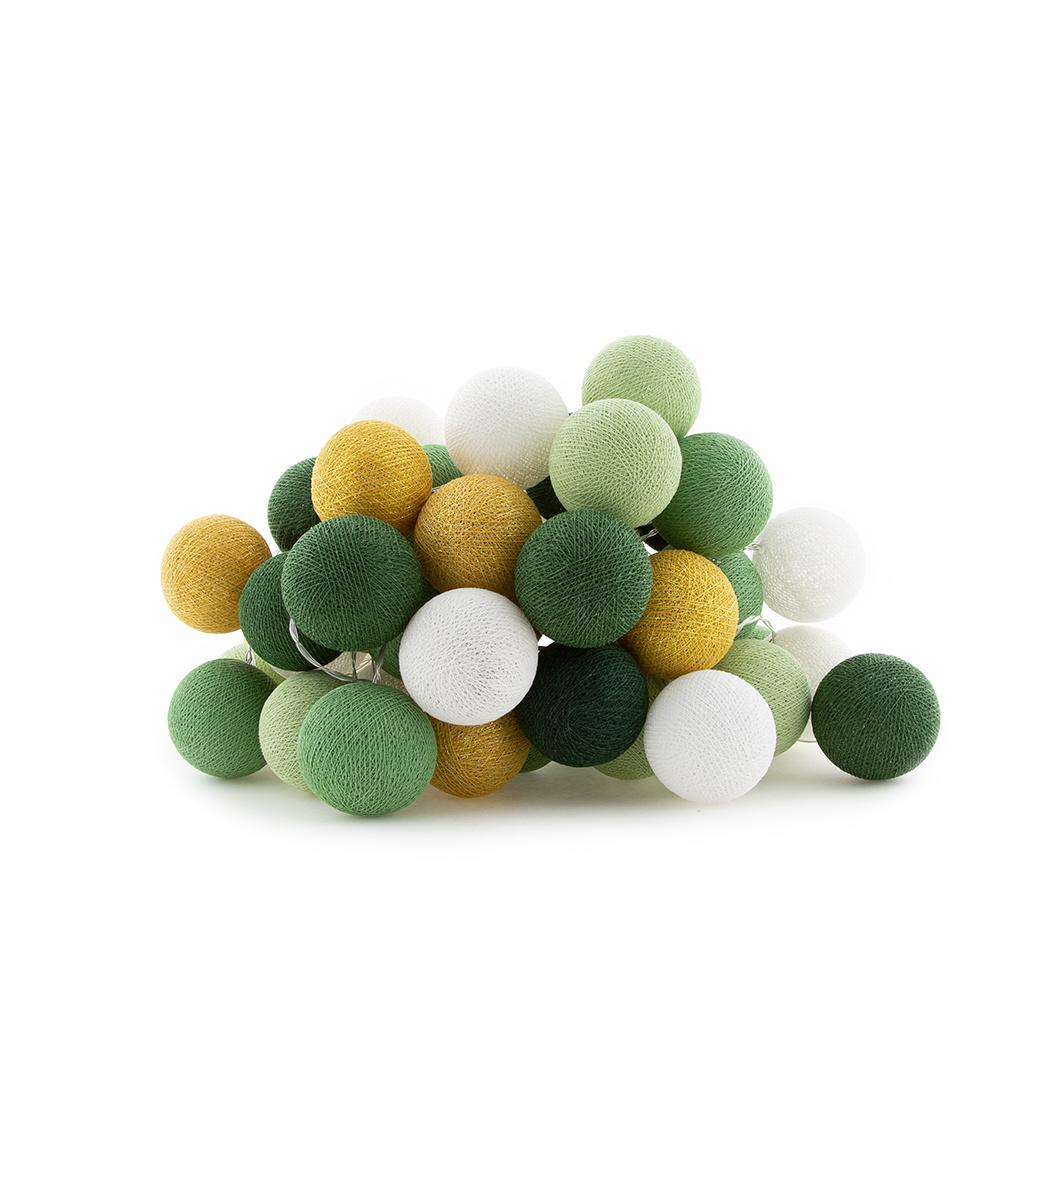 Cotton Ball Lights sparkling lichtslinger groen en goud - Sparkle Palm